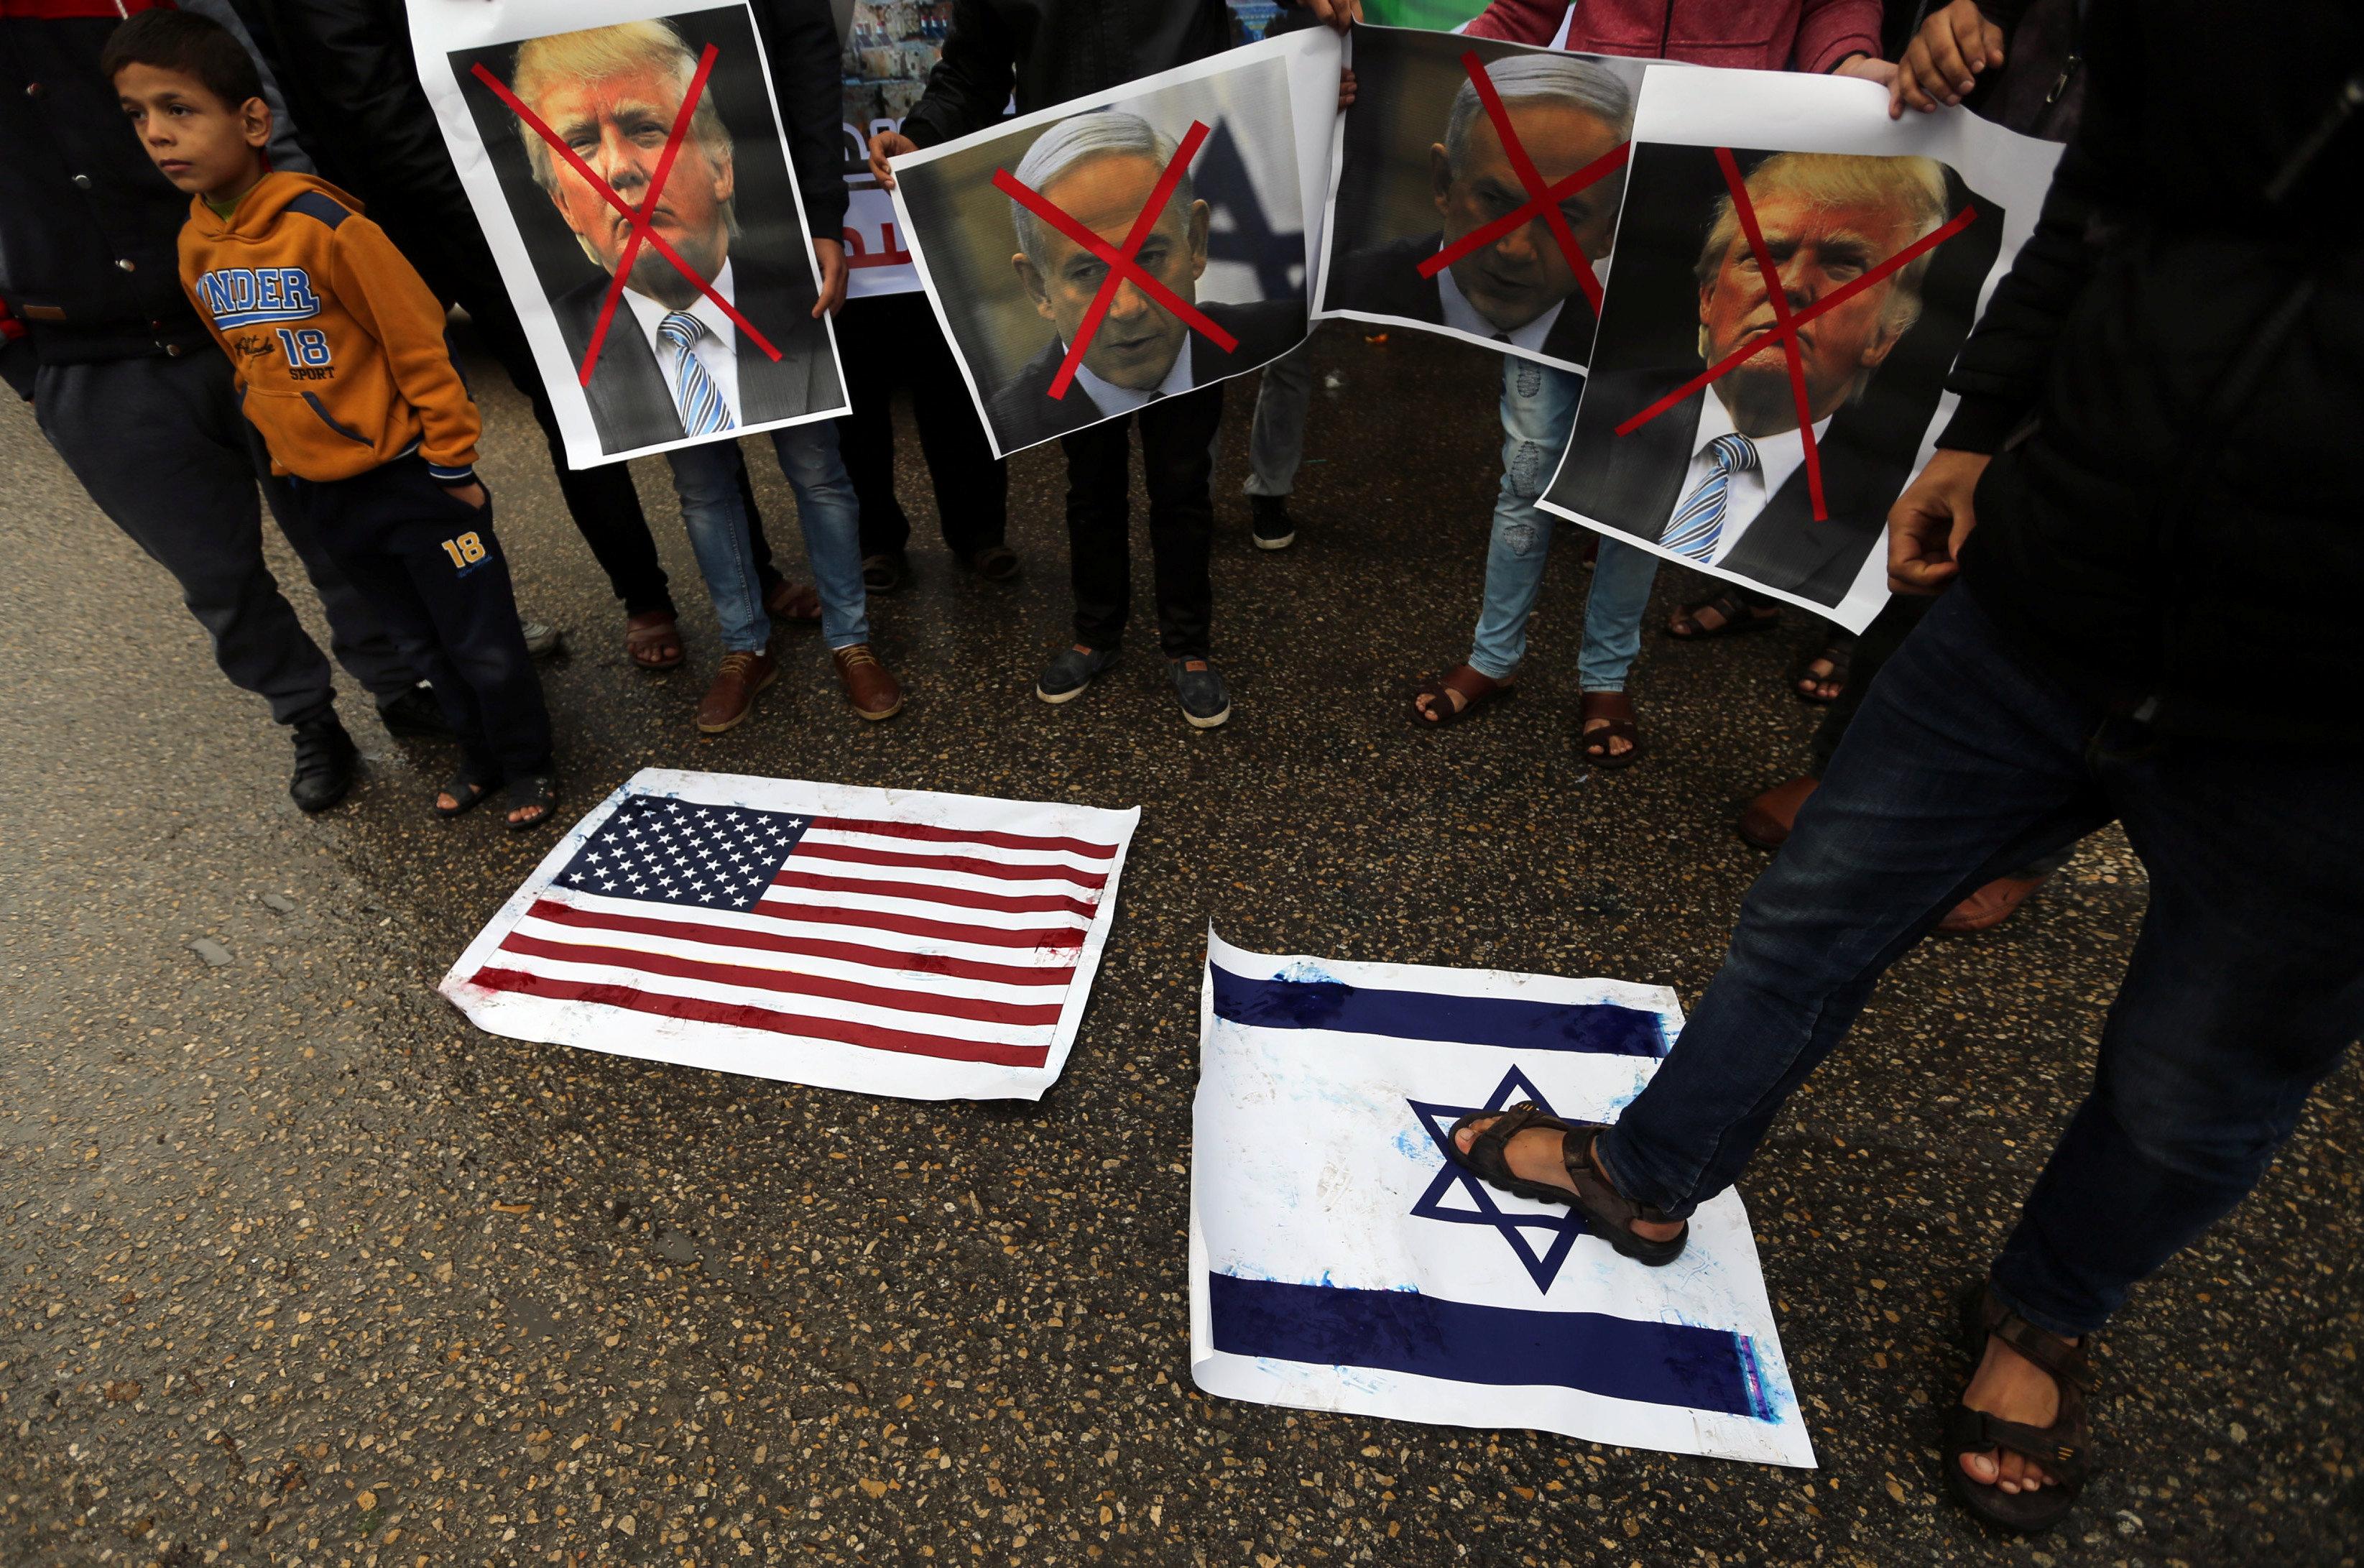 Frustration and fury among Arabs at Trump's Jerusalem declaration